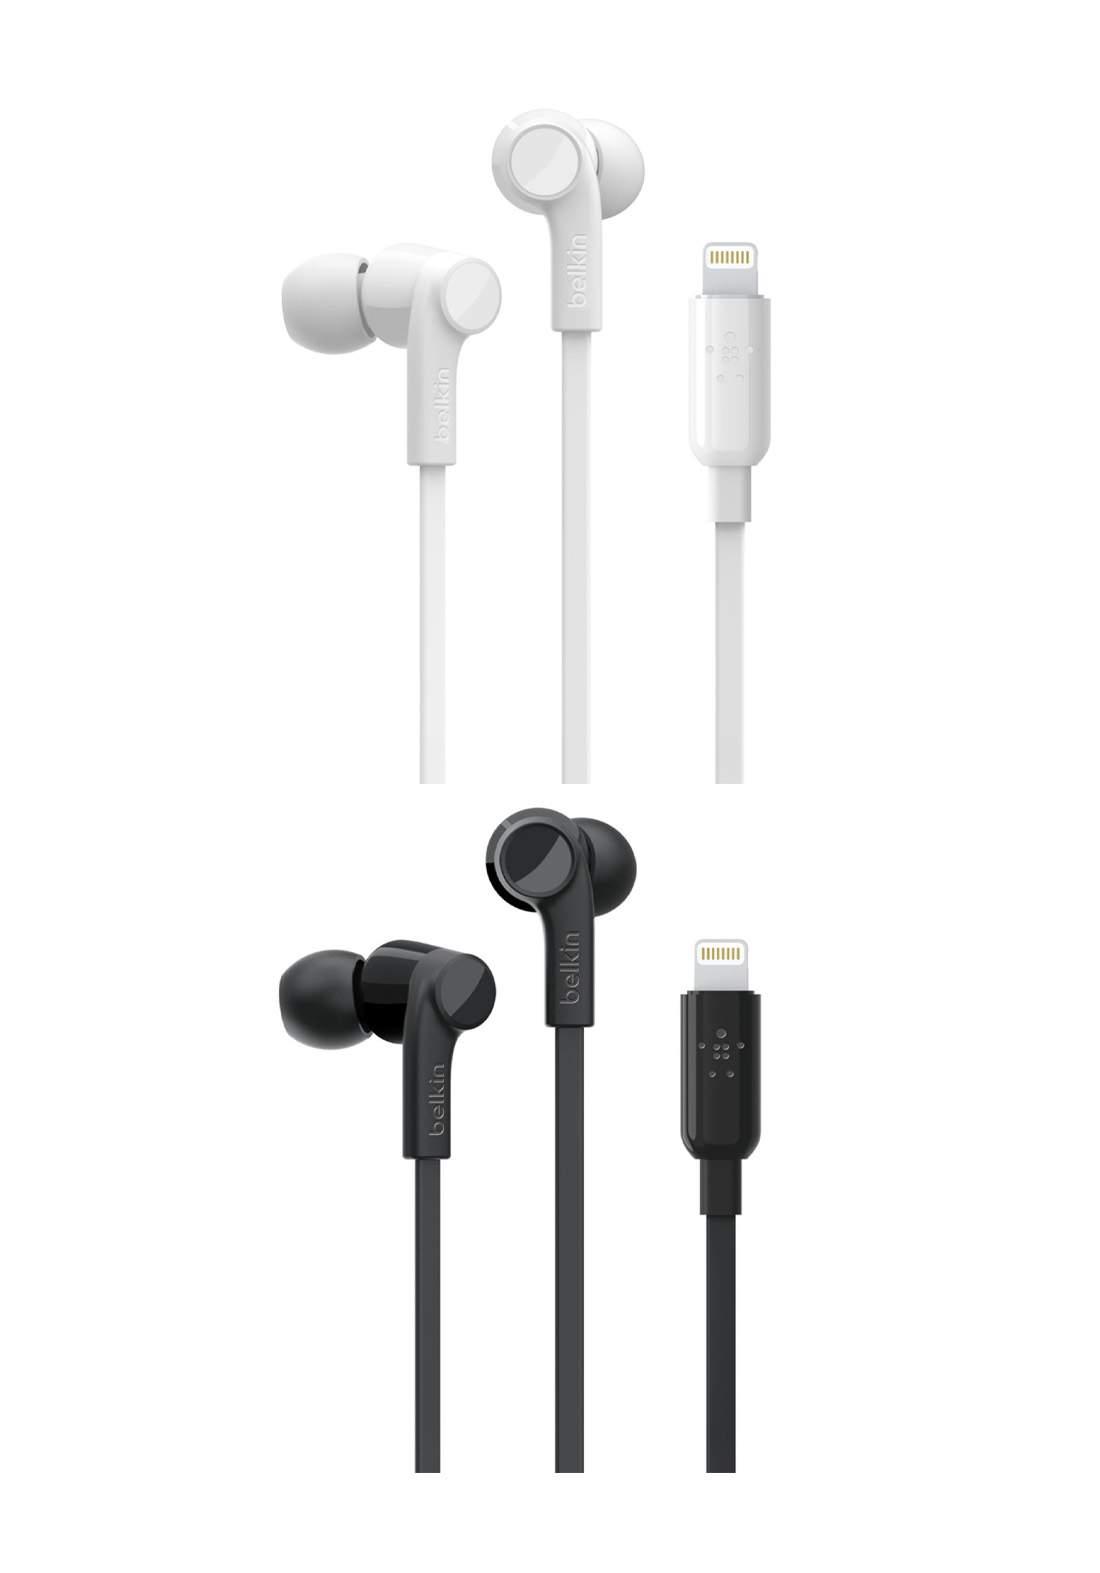 Belkin Wired Earphones with Lightning Connector سماعة